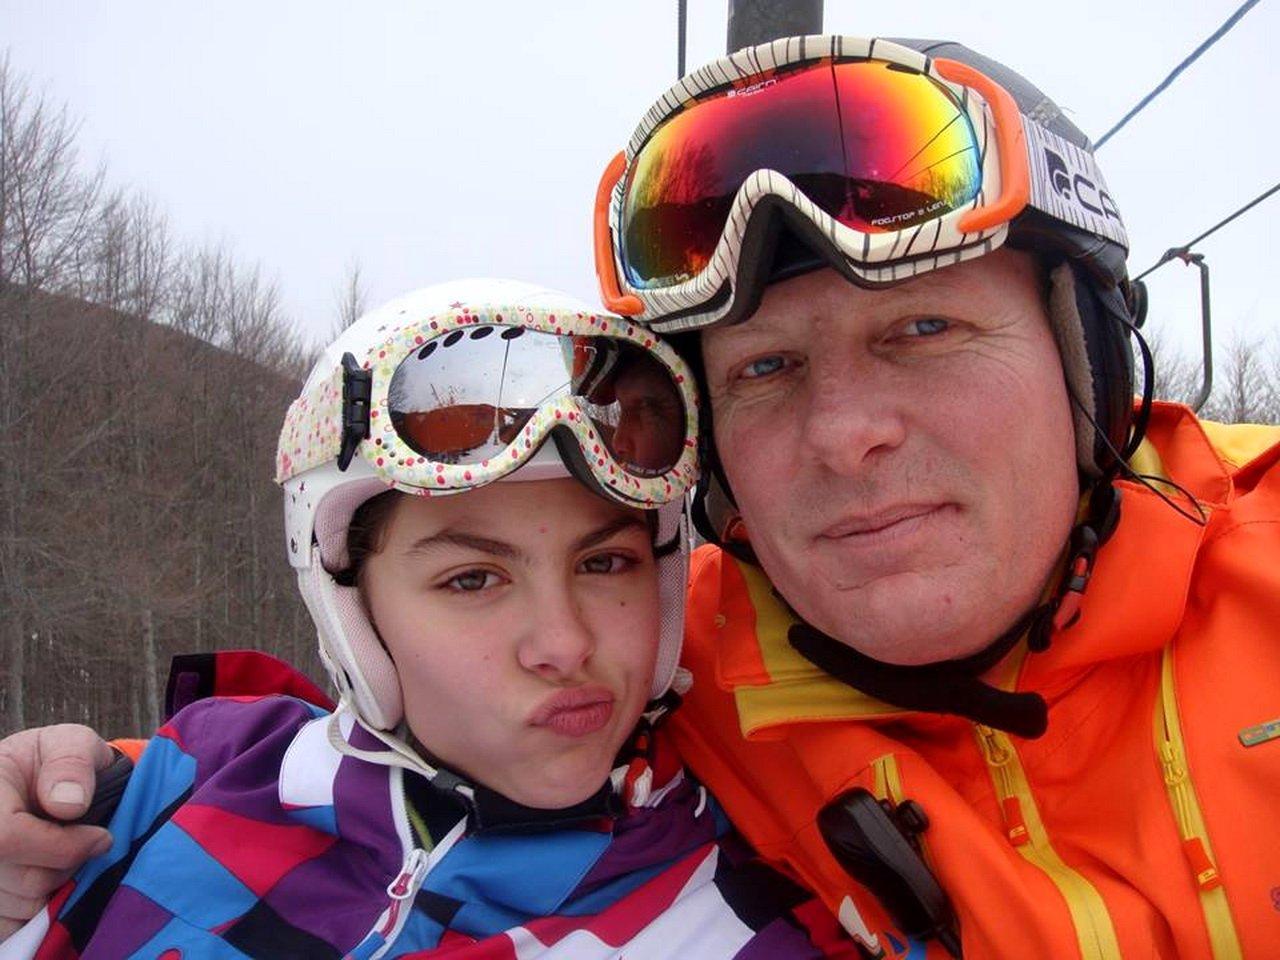 skiteam.gr-ski-academy-thessaloniki-2nd-weekend-18-19-january-2015-3-5-pigadiai-07